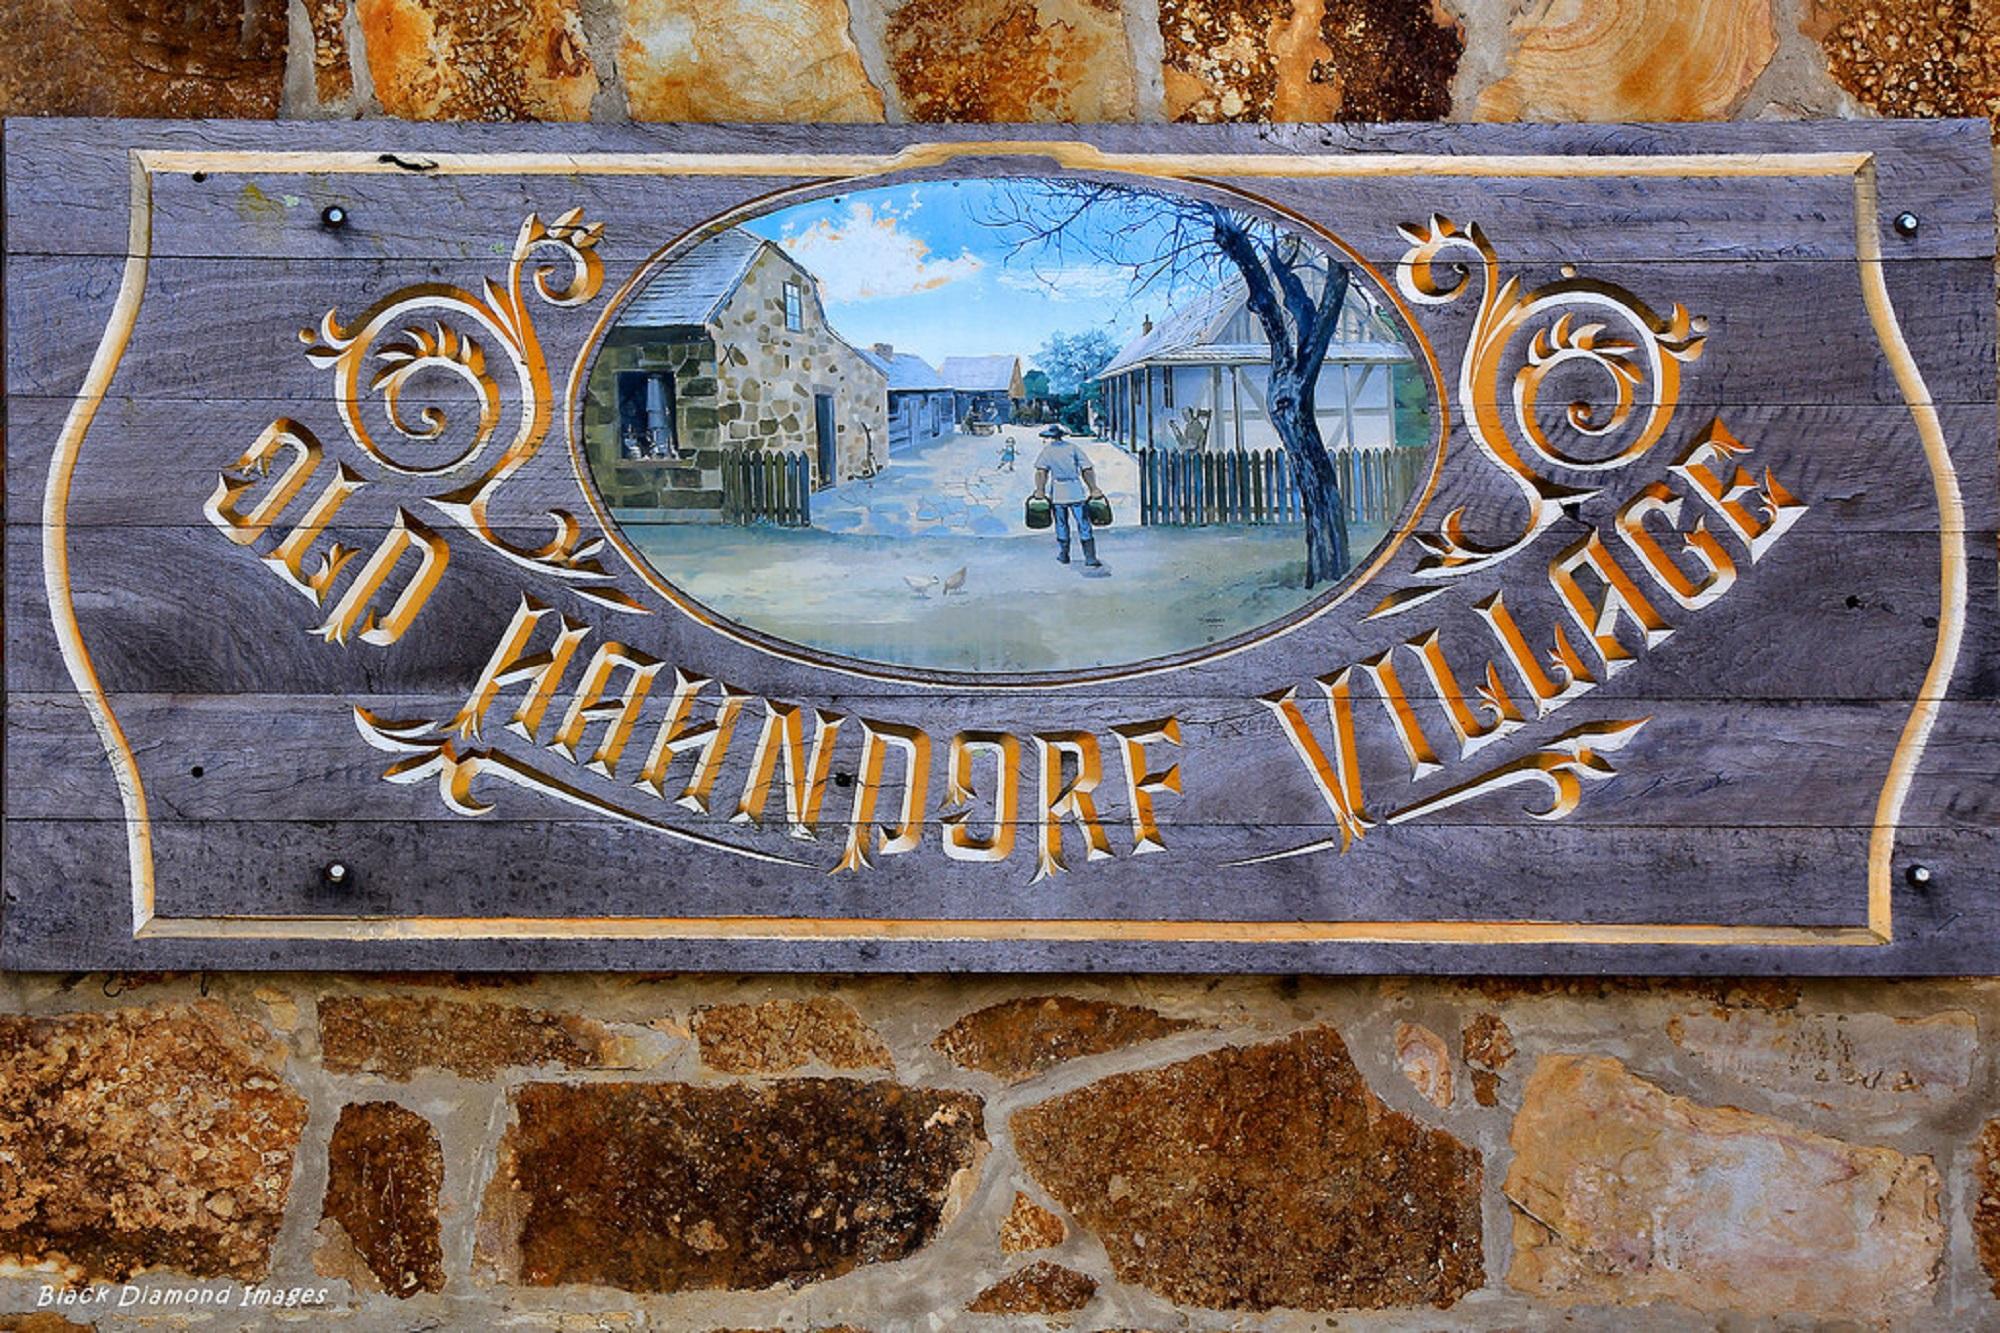 Exploring the Amazing Hahndorf